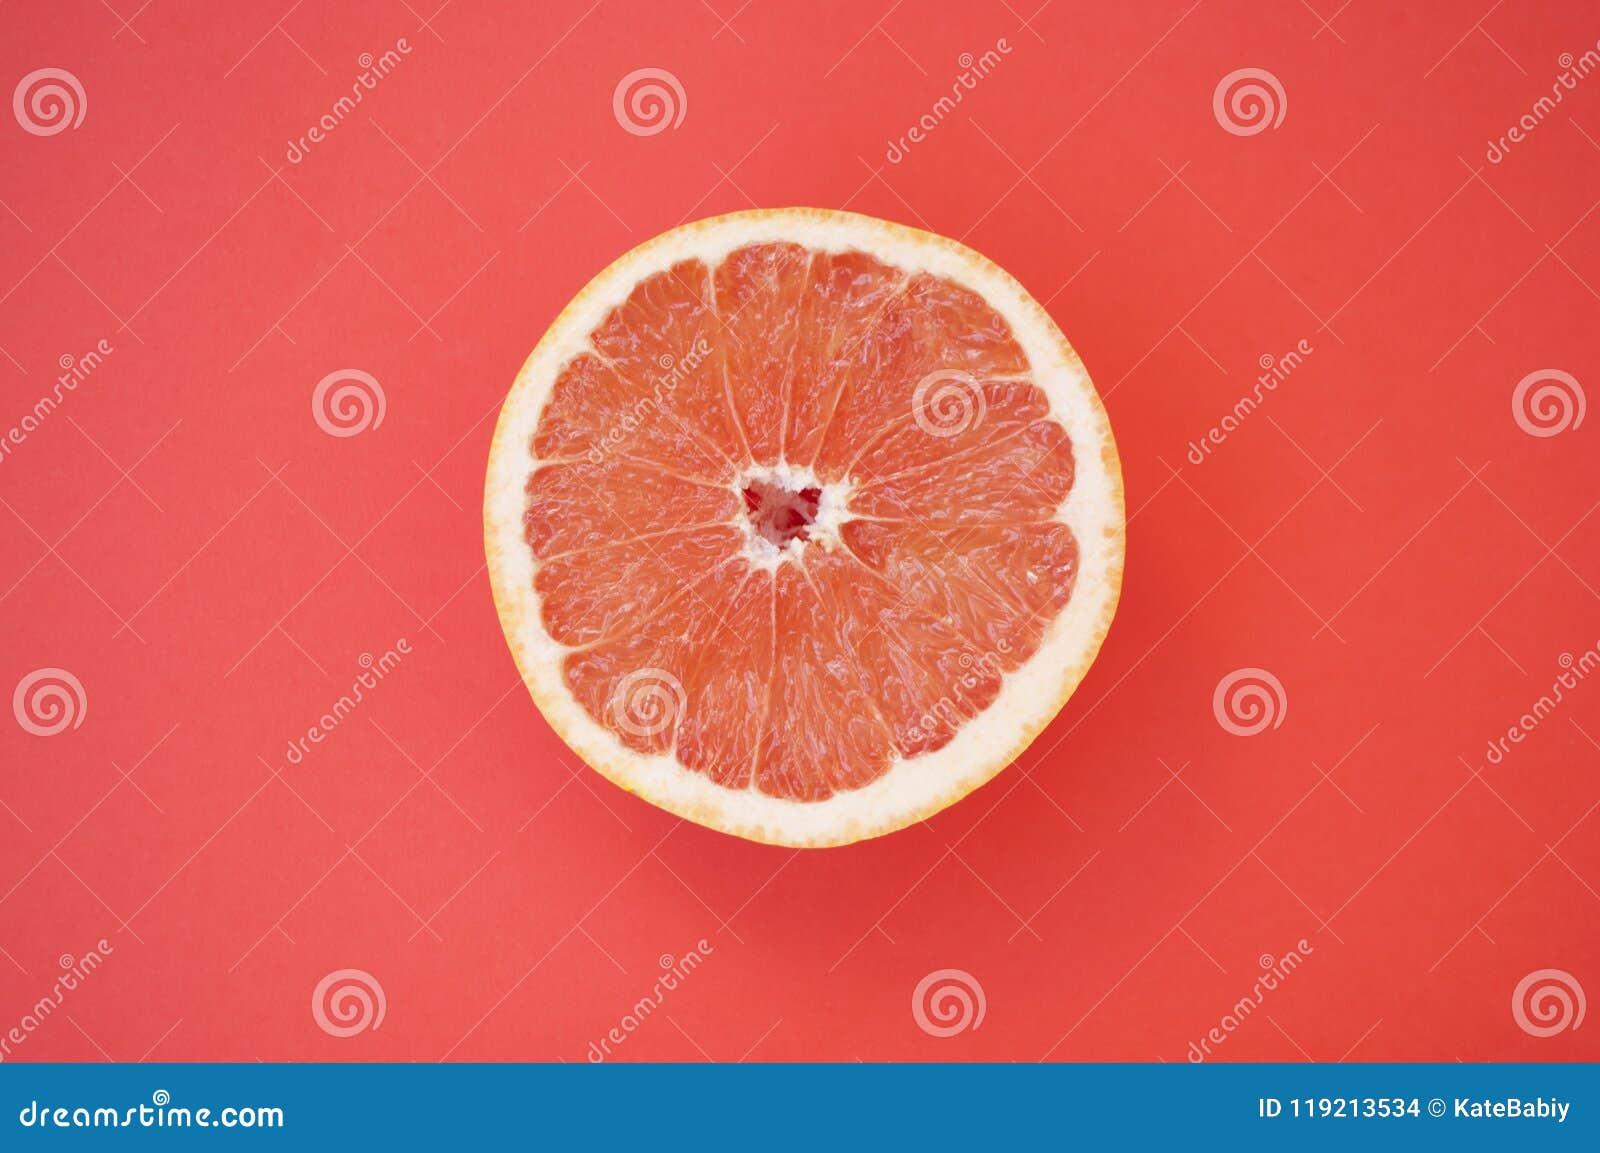 Halved grapefruit on red background.